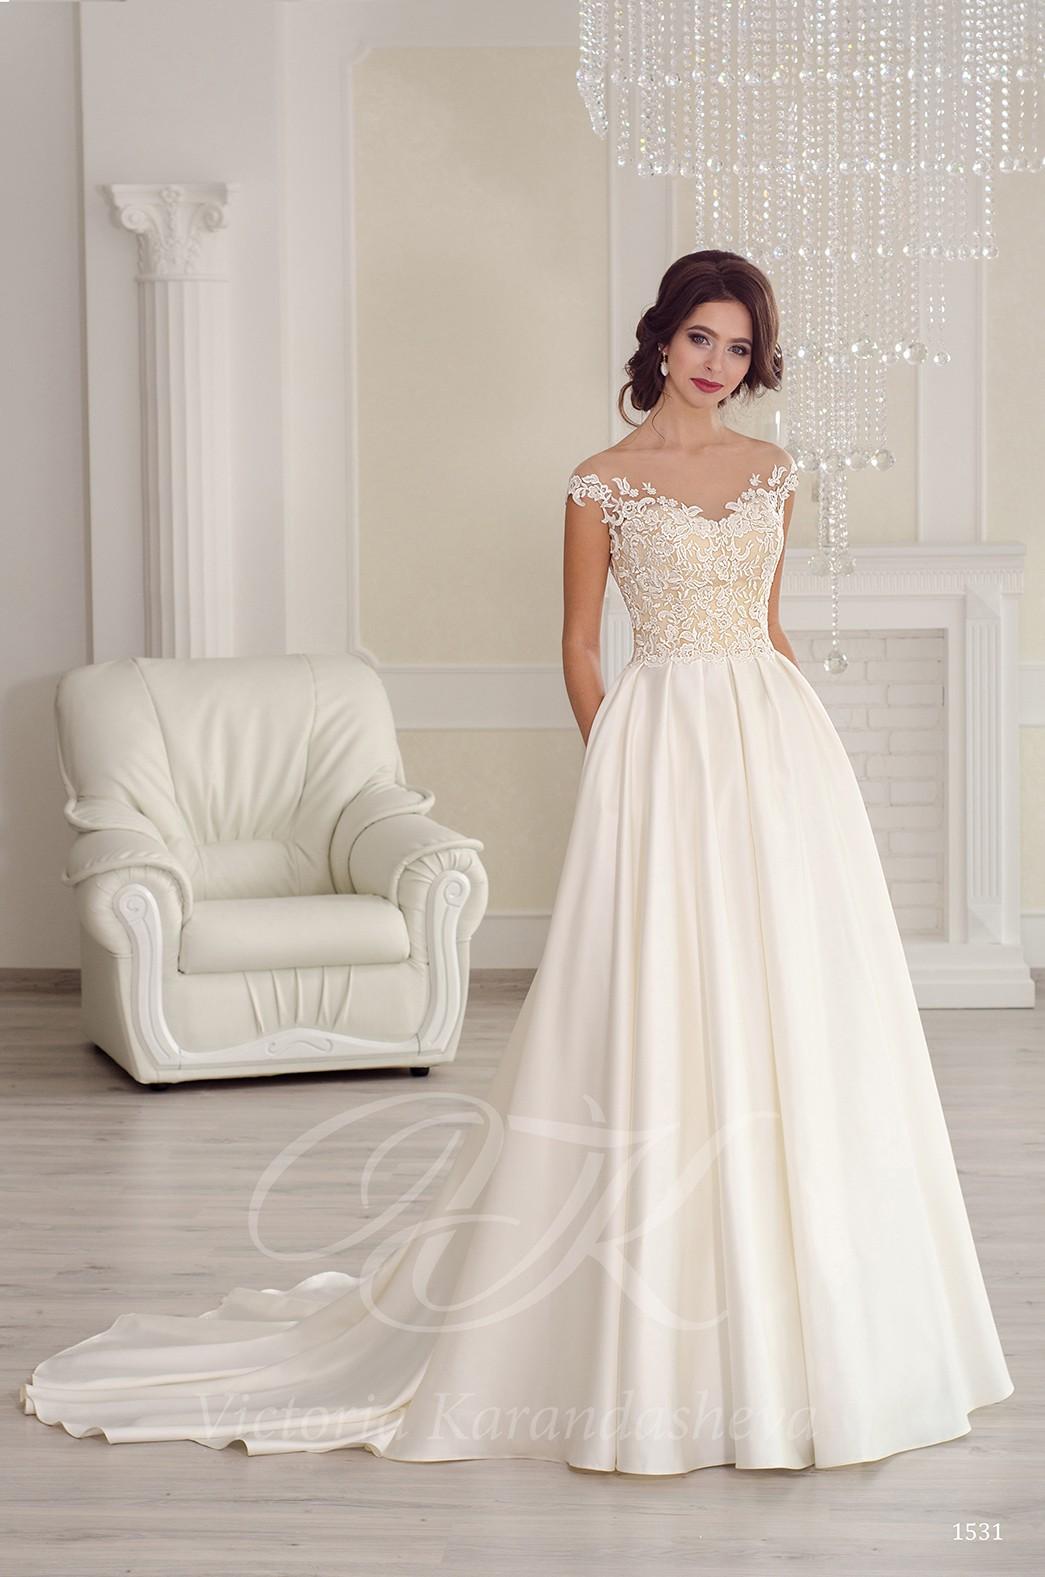 Brautkleid Modell 1531